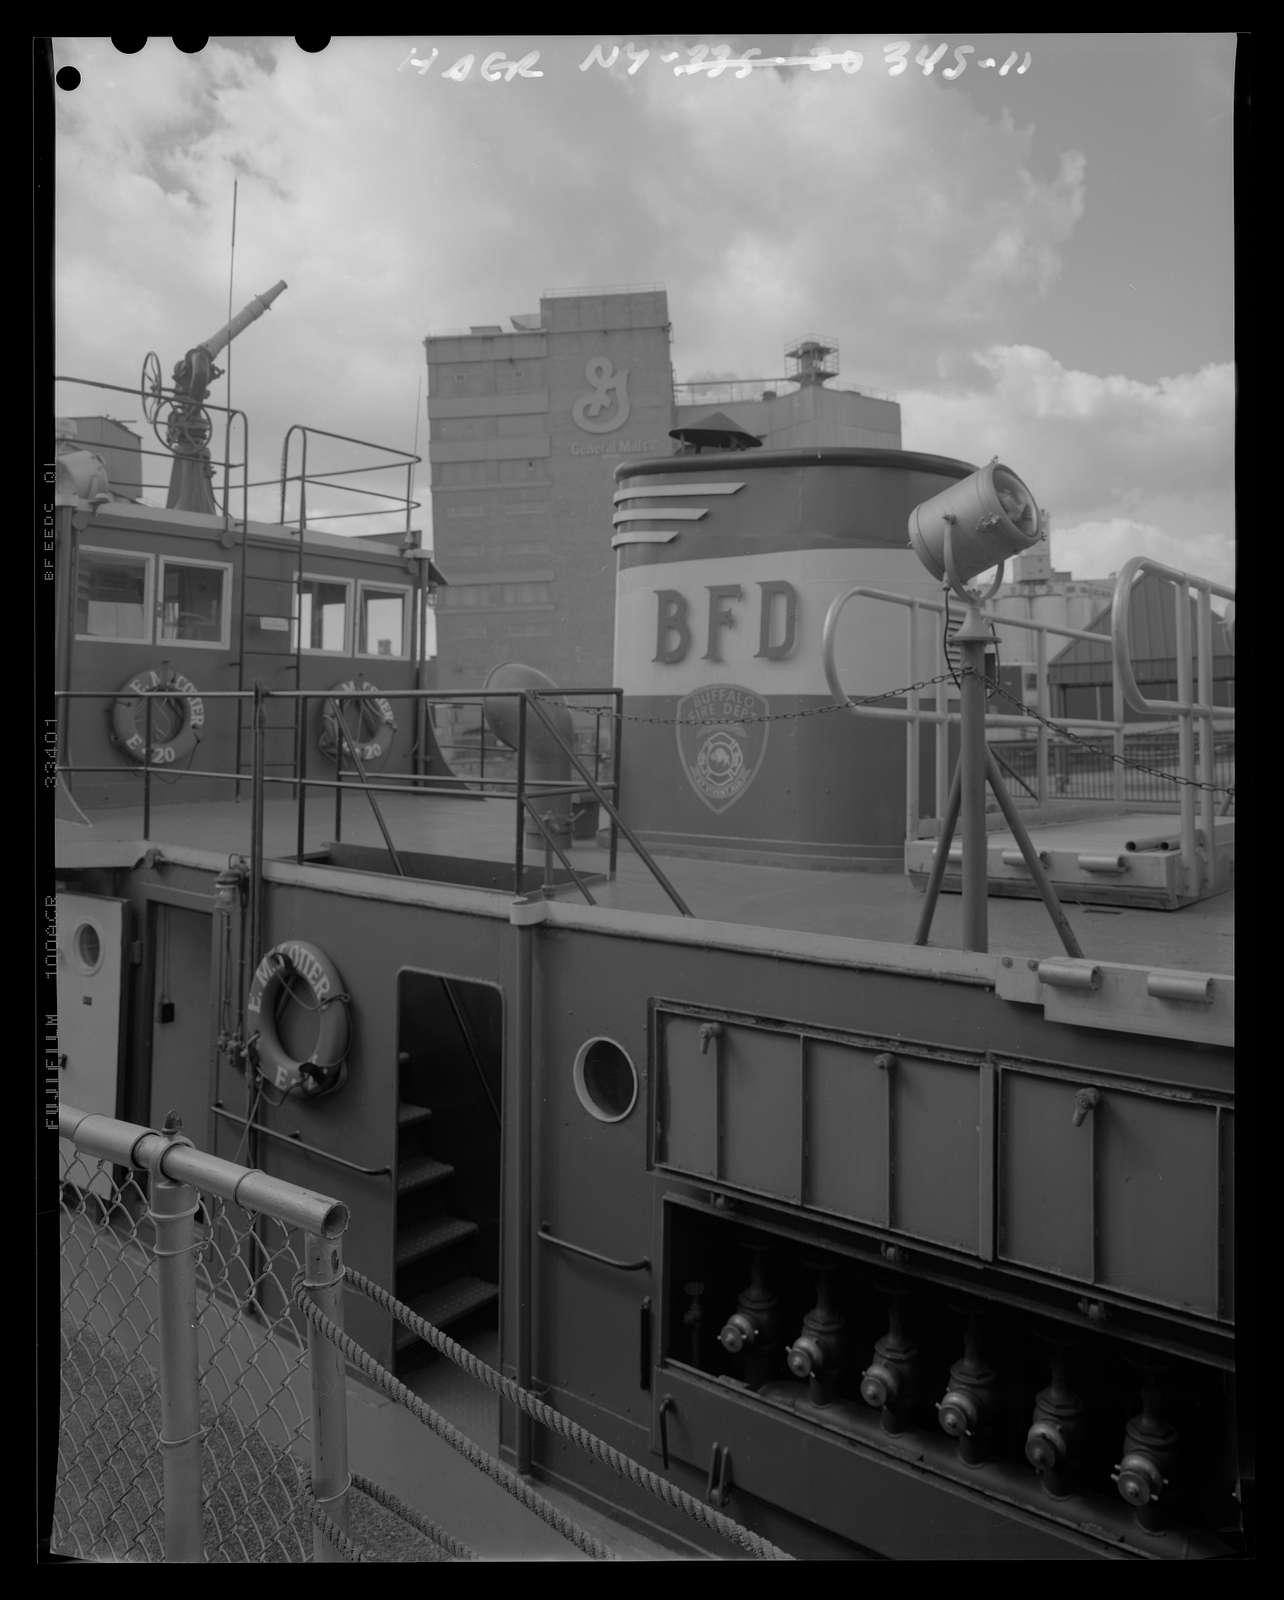 Fireboat EDWARD M. COTTER, Moored on the Buffalo River at 155 Ohio Street, Buffalo, Erie County, NY